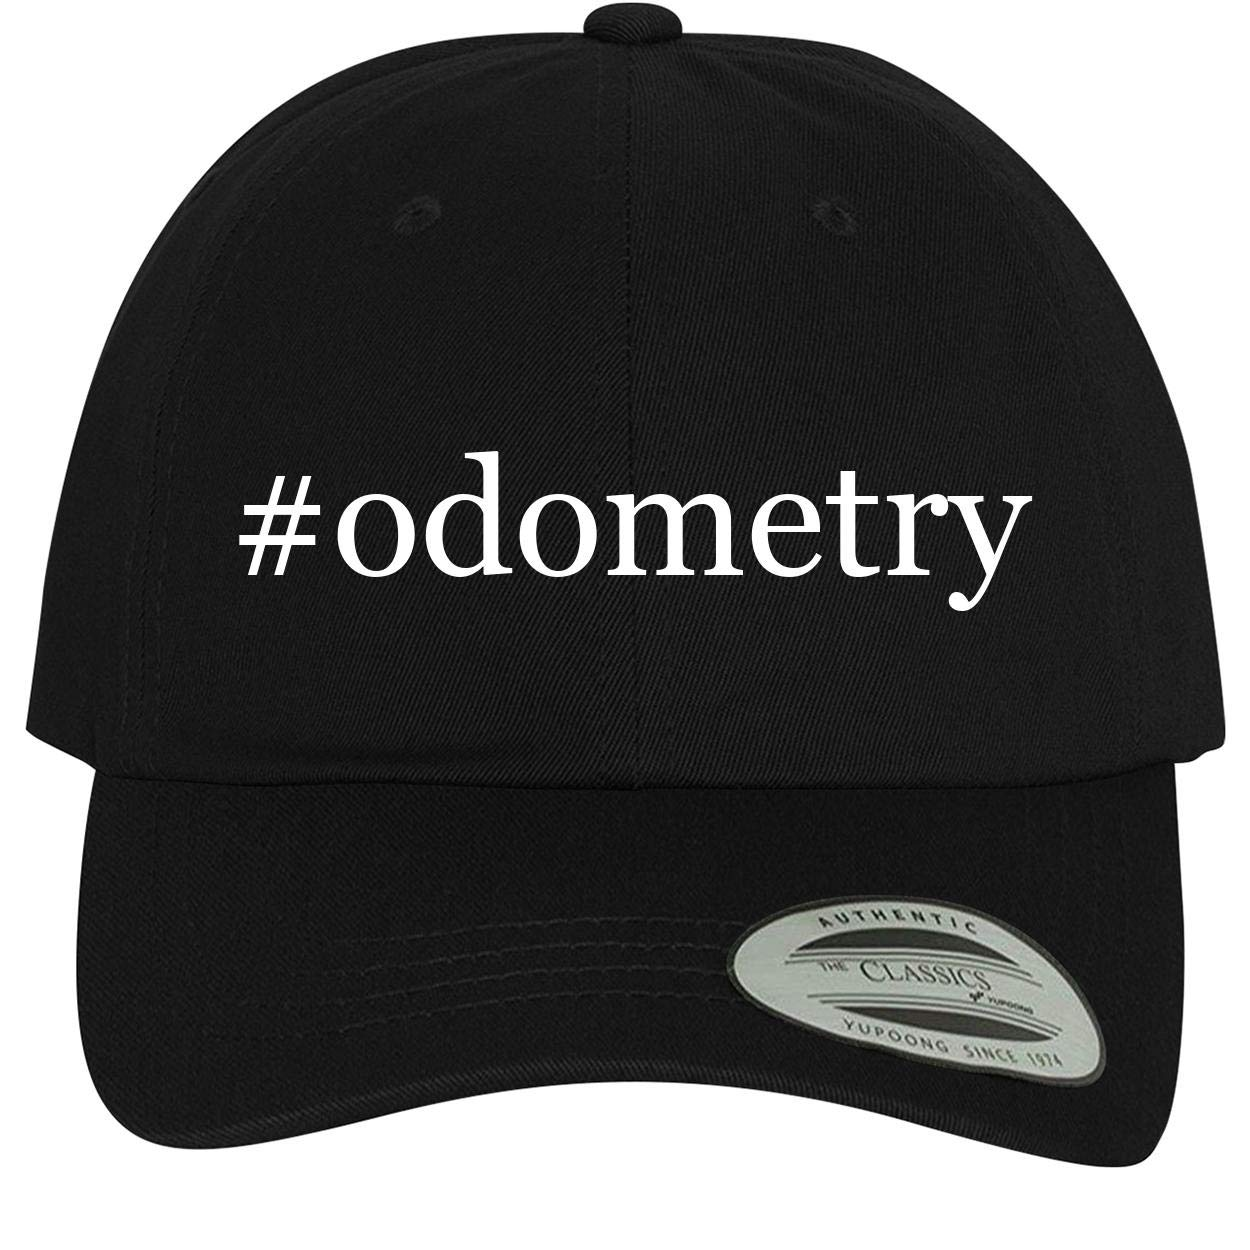 Comfortable Dad Hat Baseball Cap BH Cool Designs #Odometry